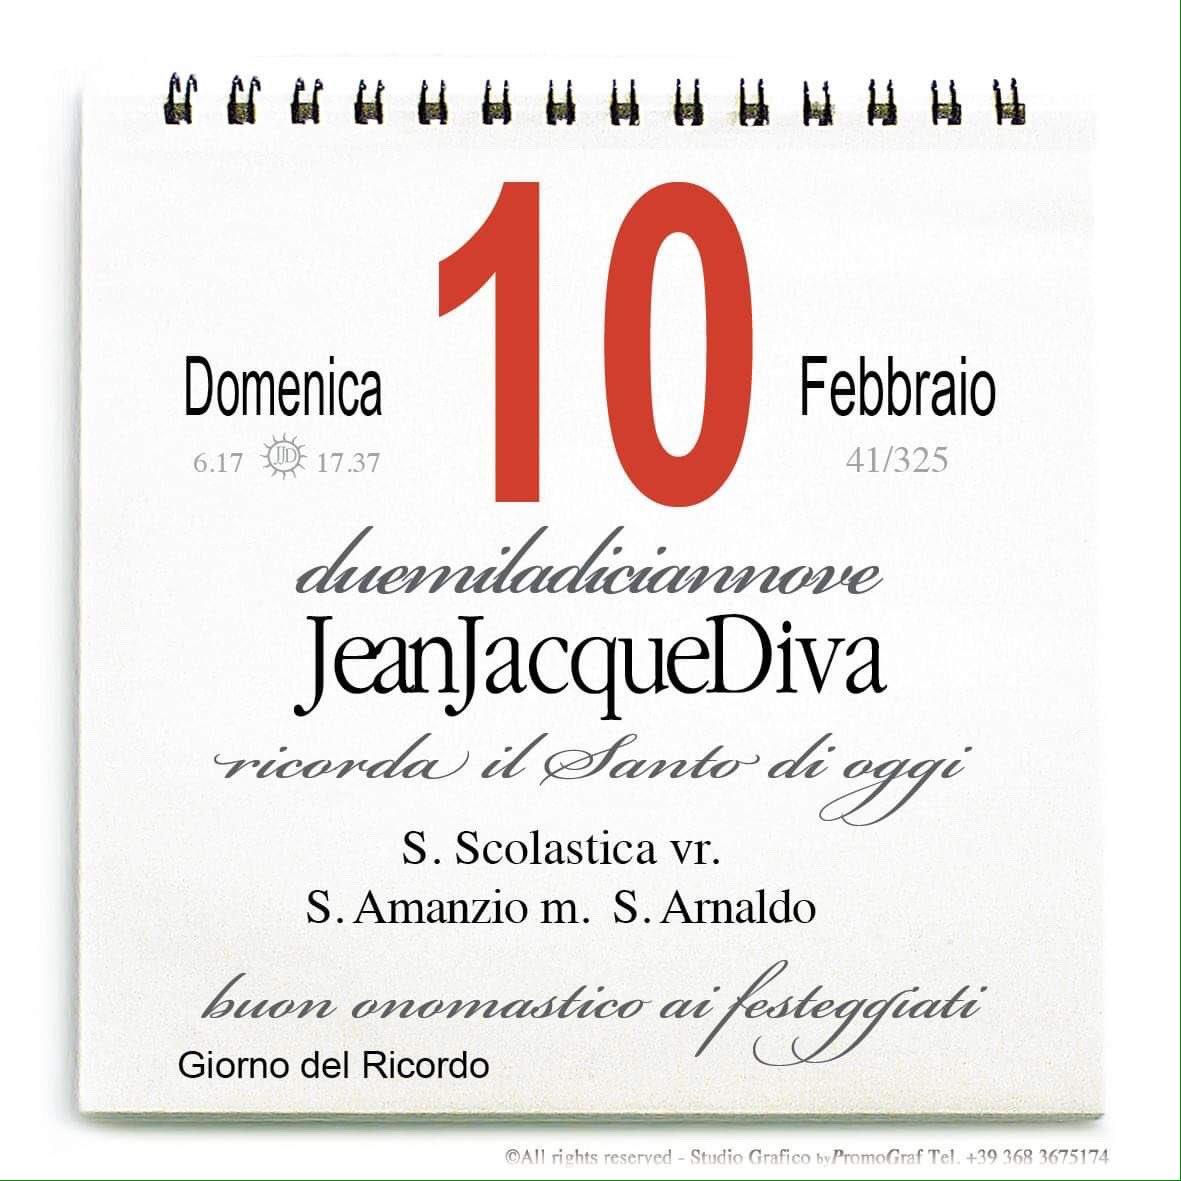 Onomastici Calendario.10ebruar Hashtag On Twitter